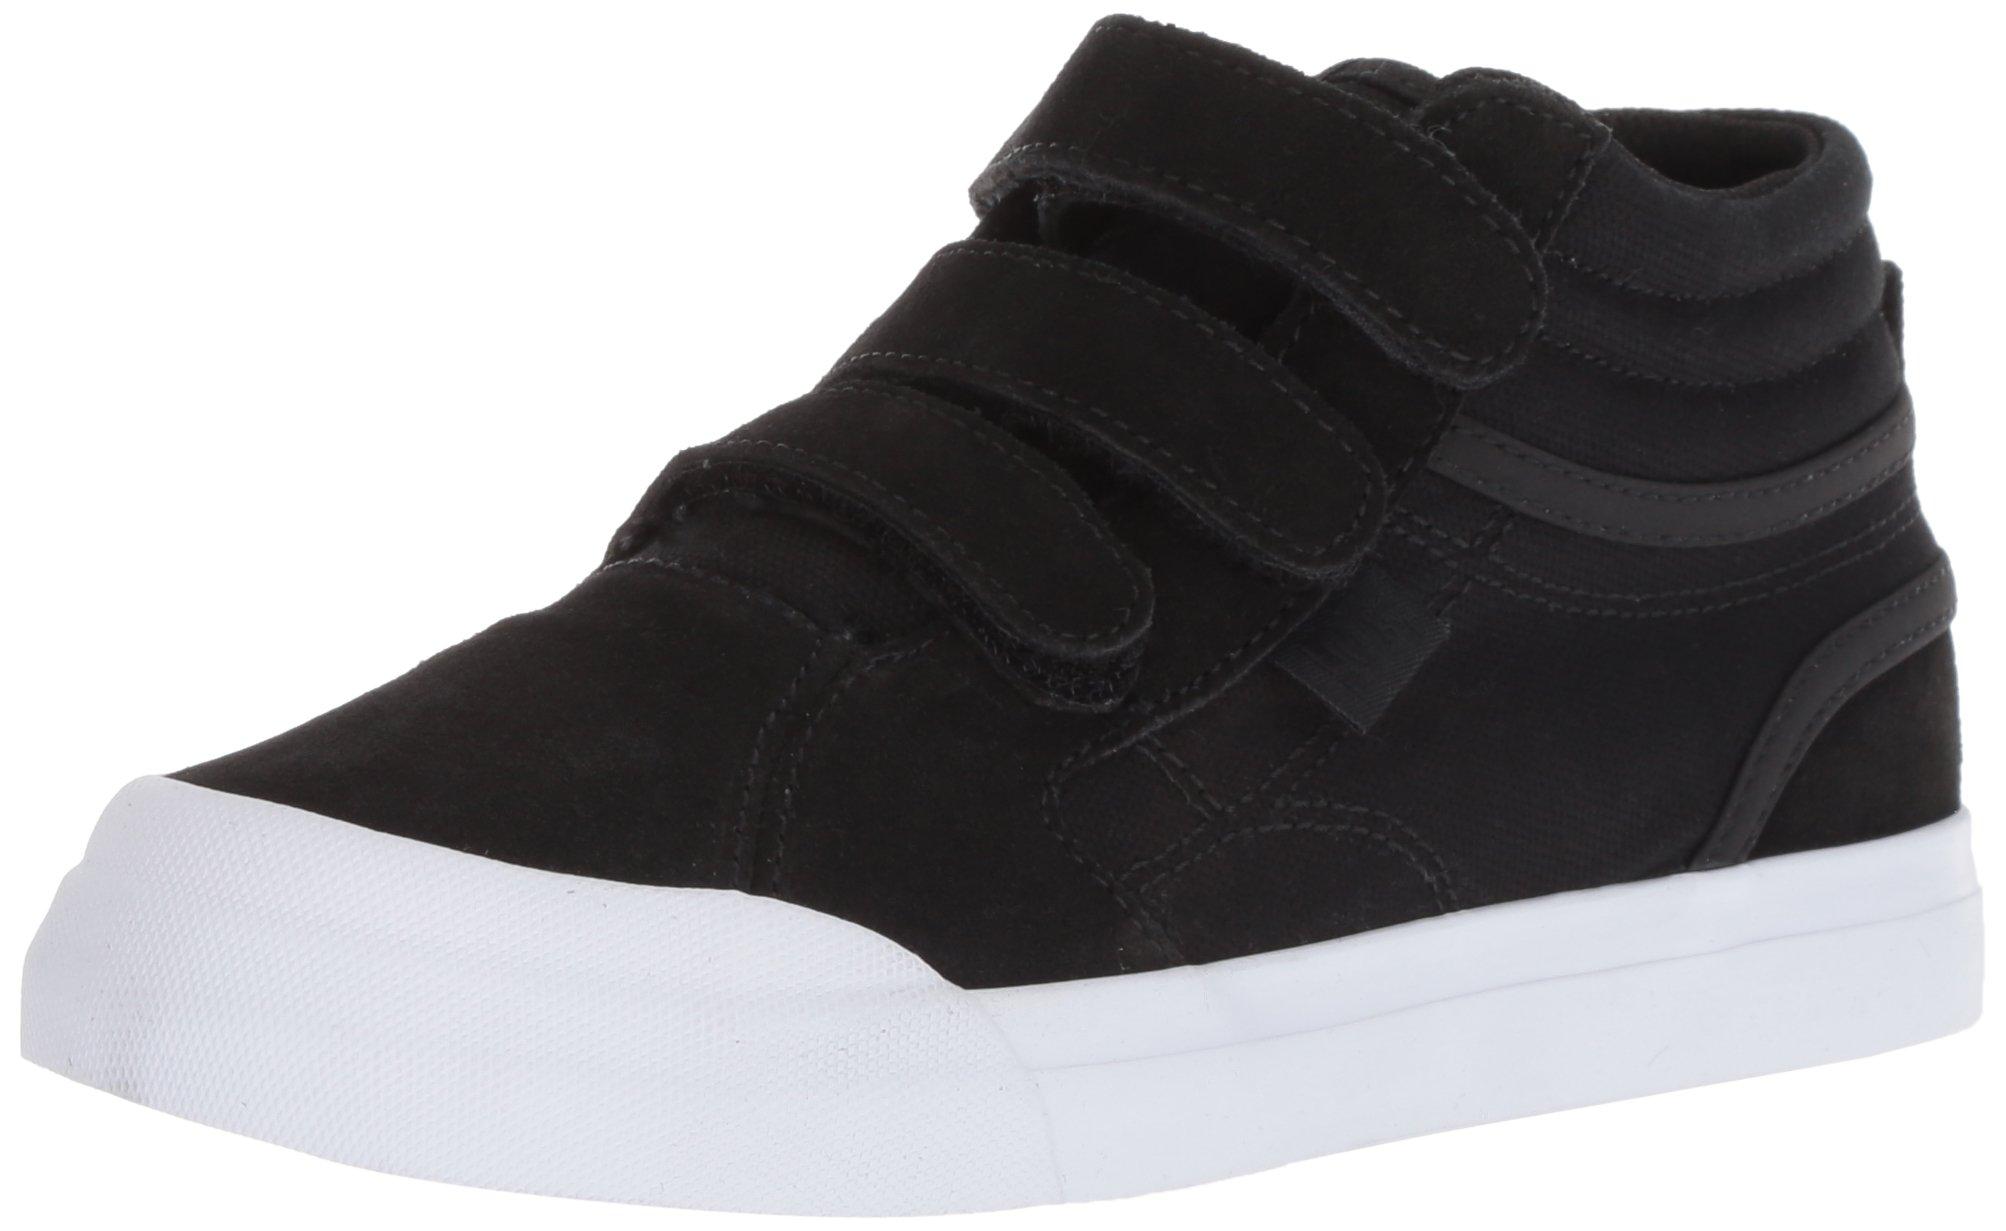 DC Boys' Evan HI V Skate Shoe, Black/White, 6.5 M US Big Kid